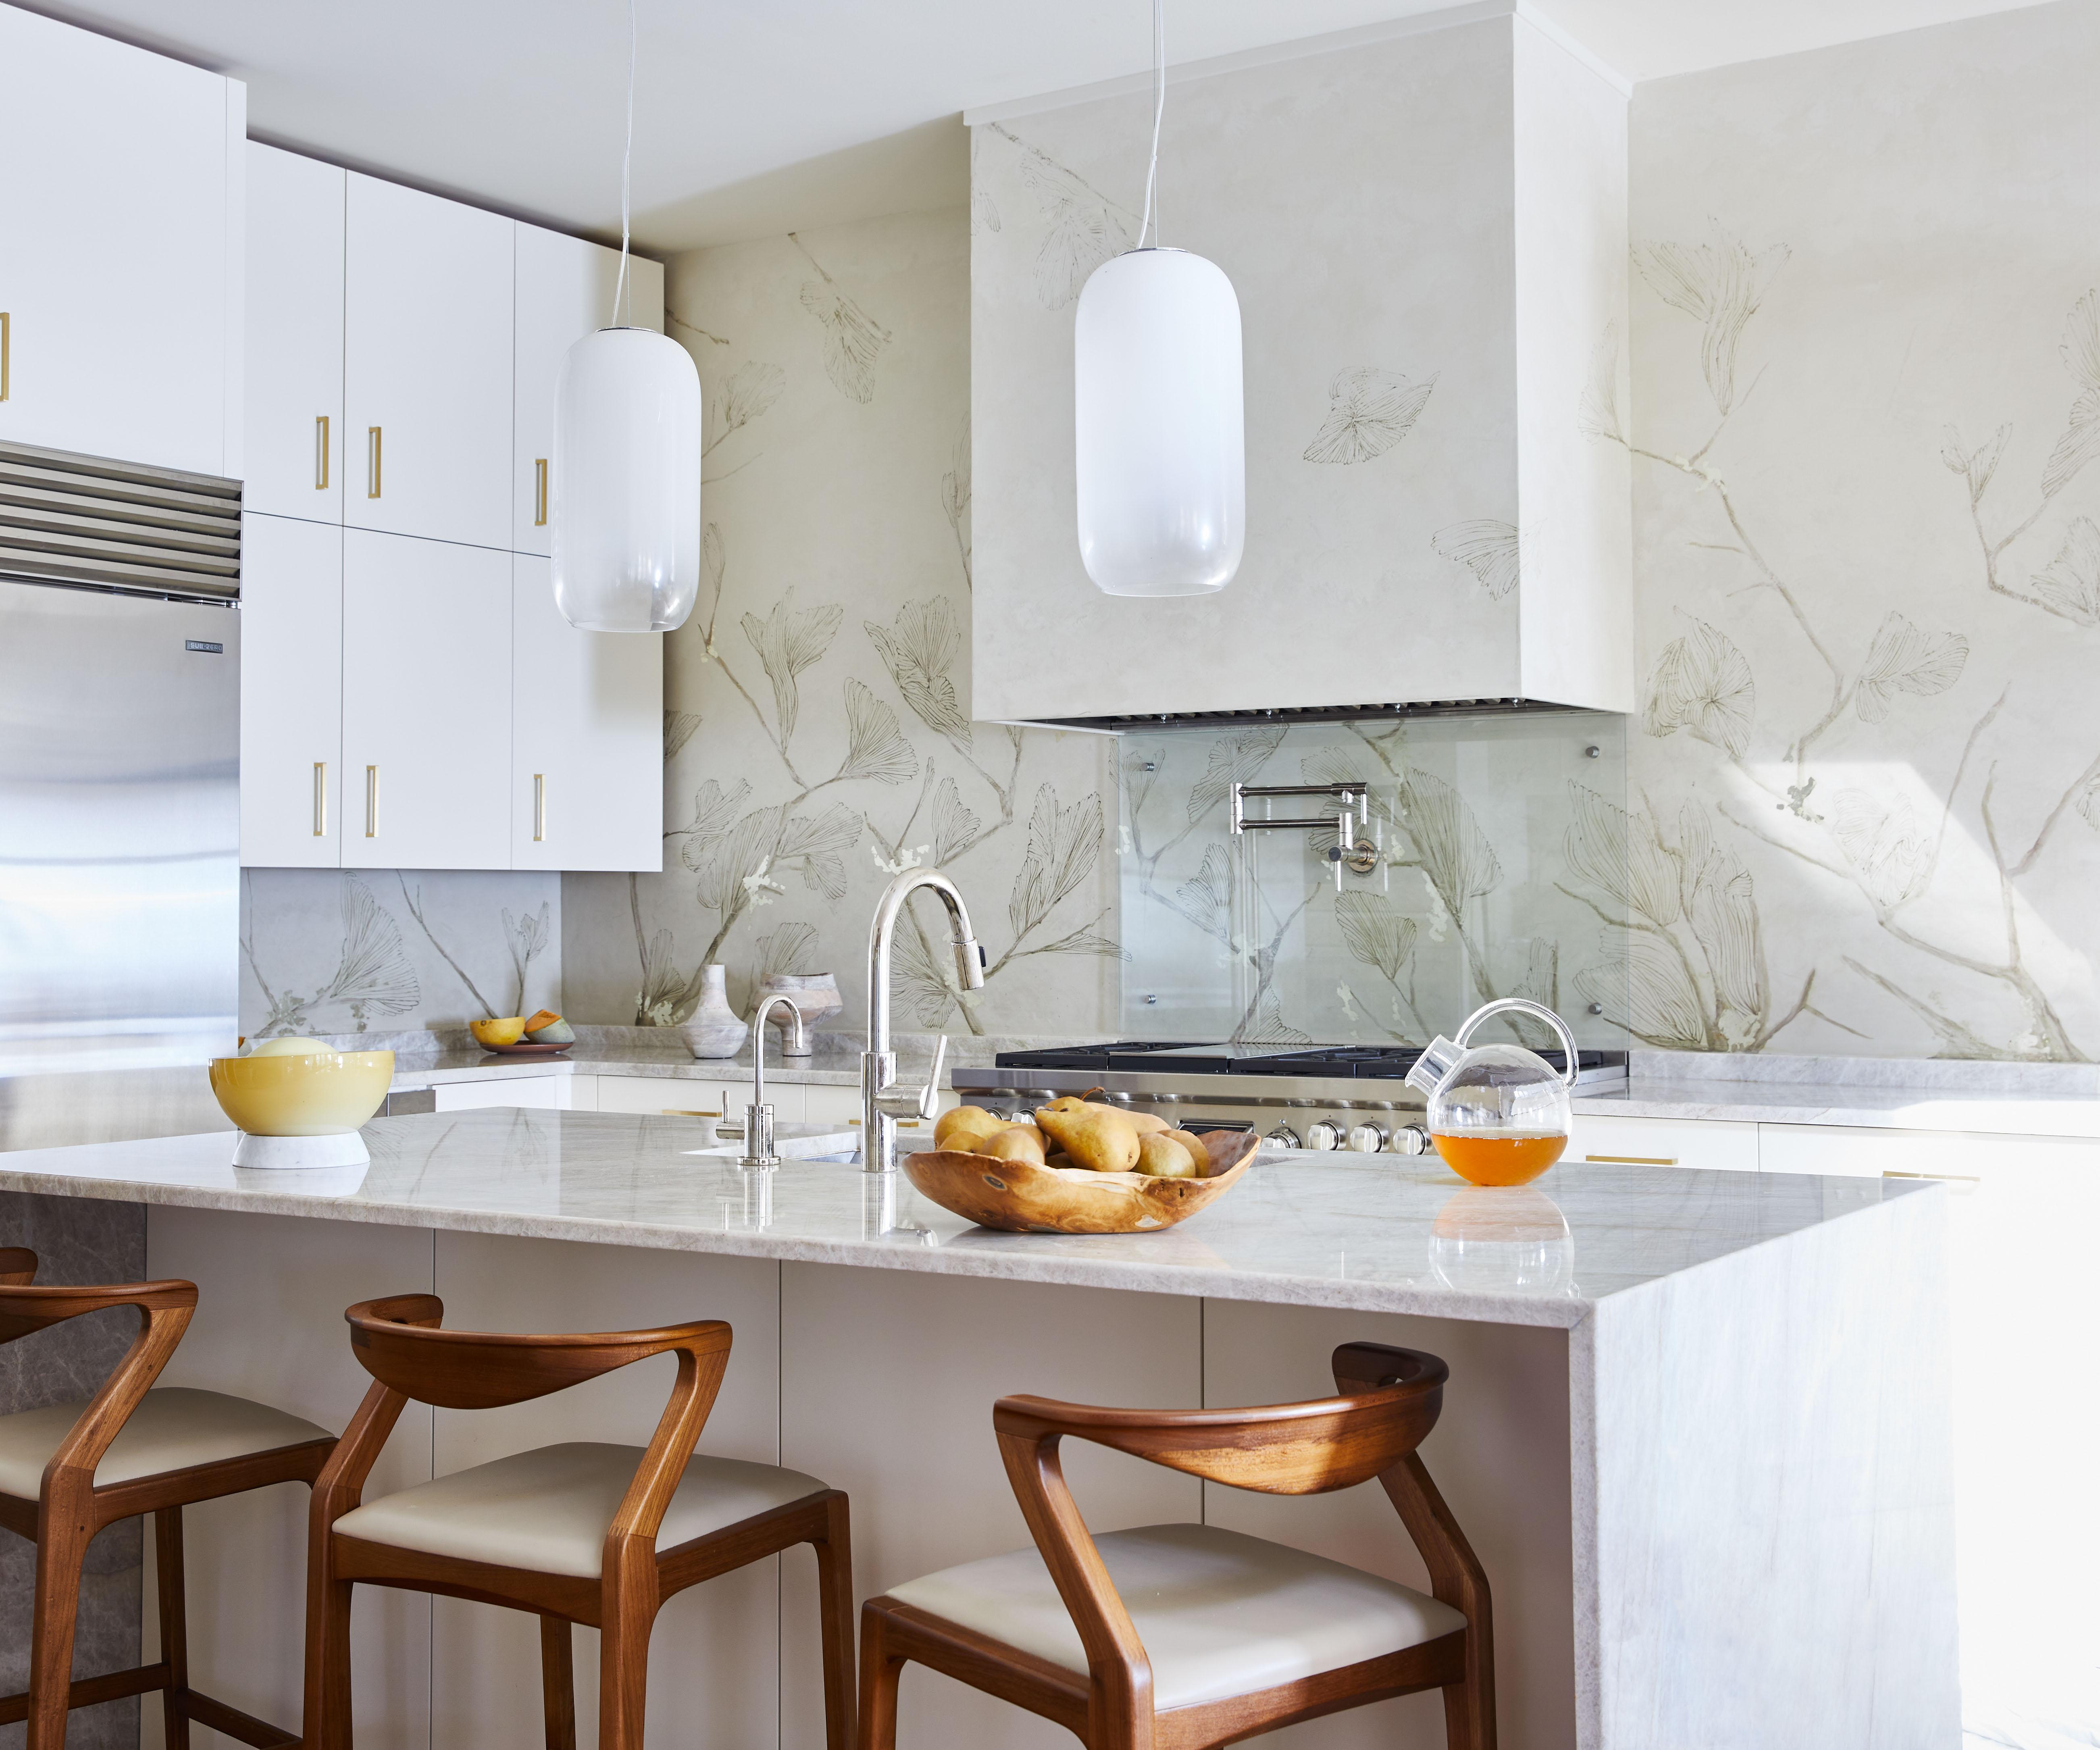 Custom Kitchen, Naturel sur Scène, Home Design - Valerie Legras Atelier